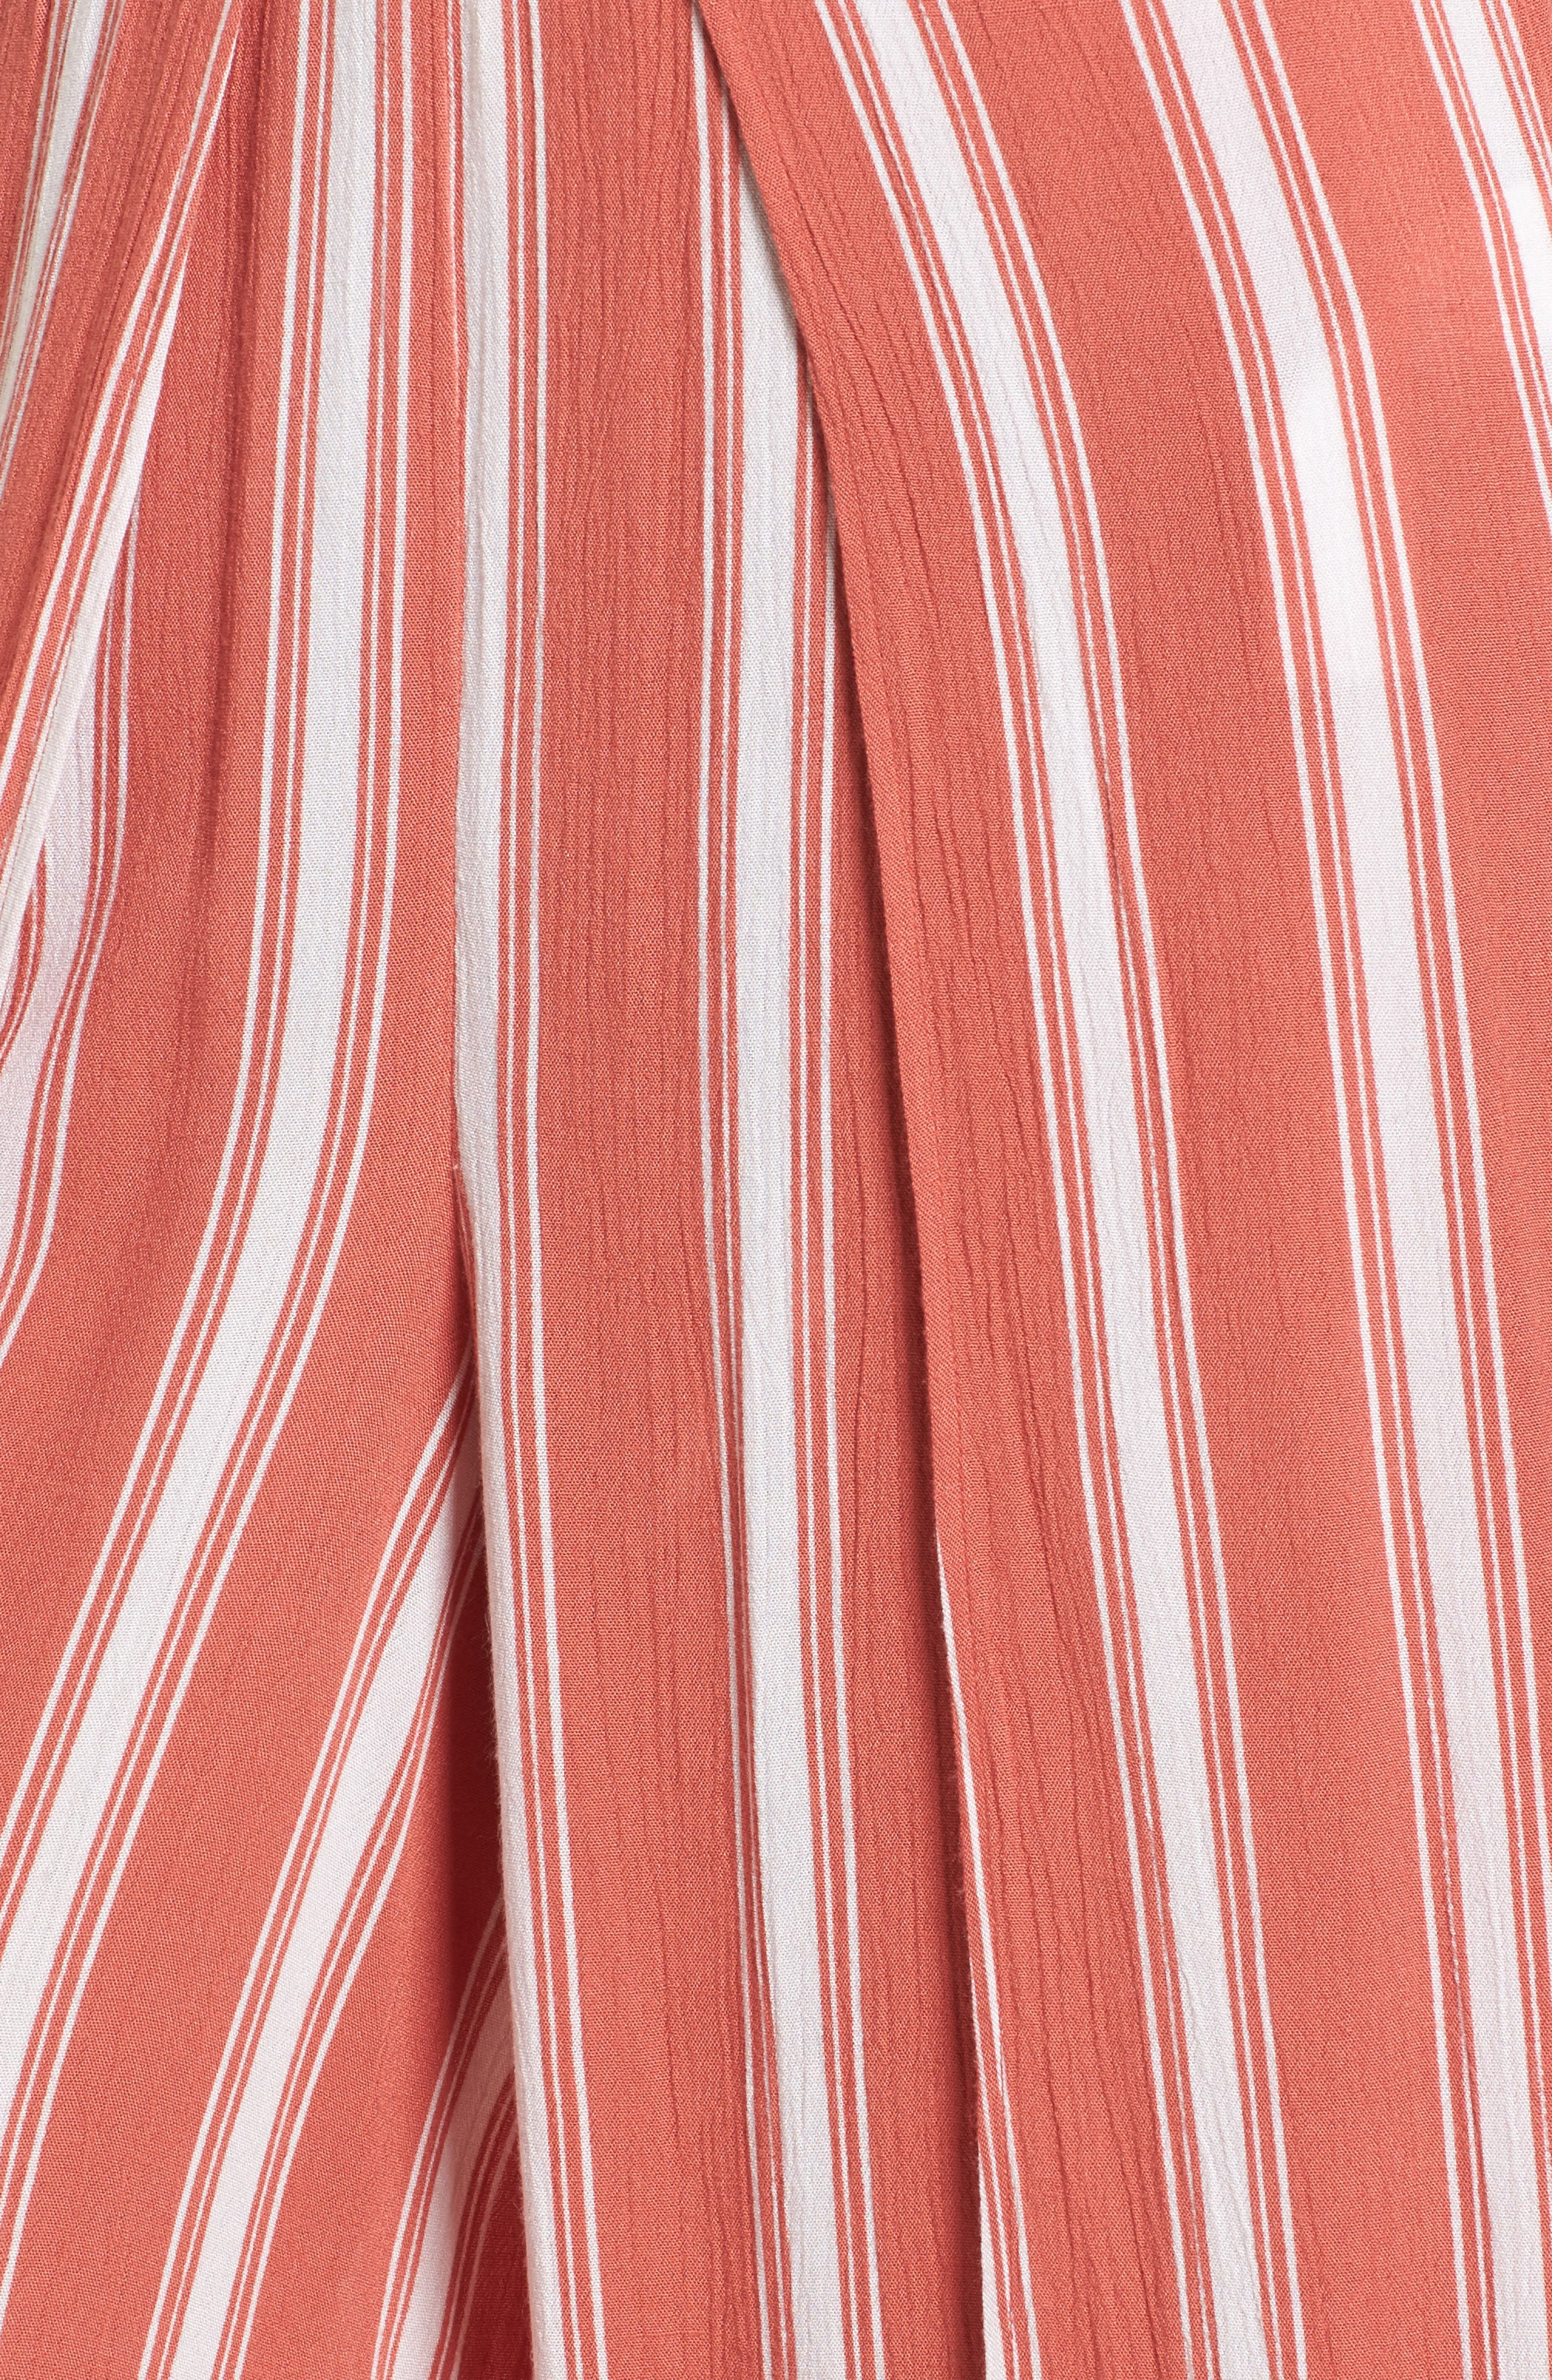 Stripe Split Leg Walkthrough Pants,                             Alternate thumbnail 5, color,                             950